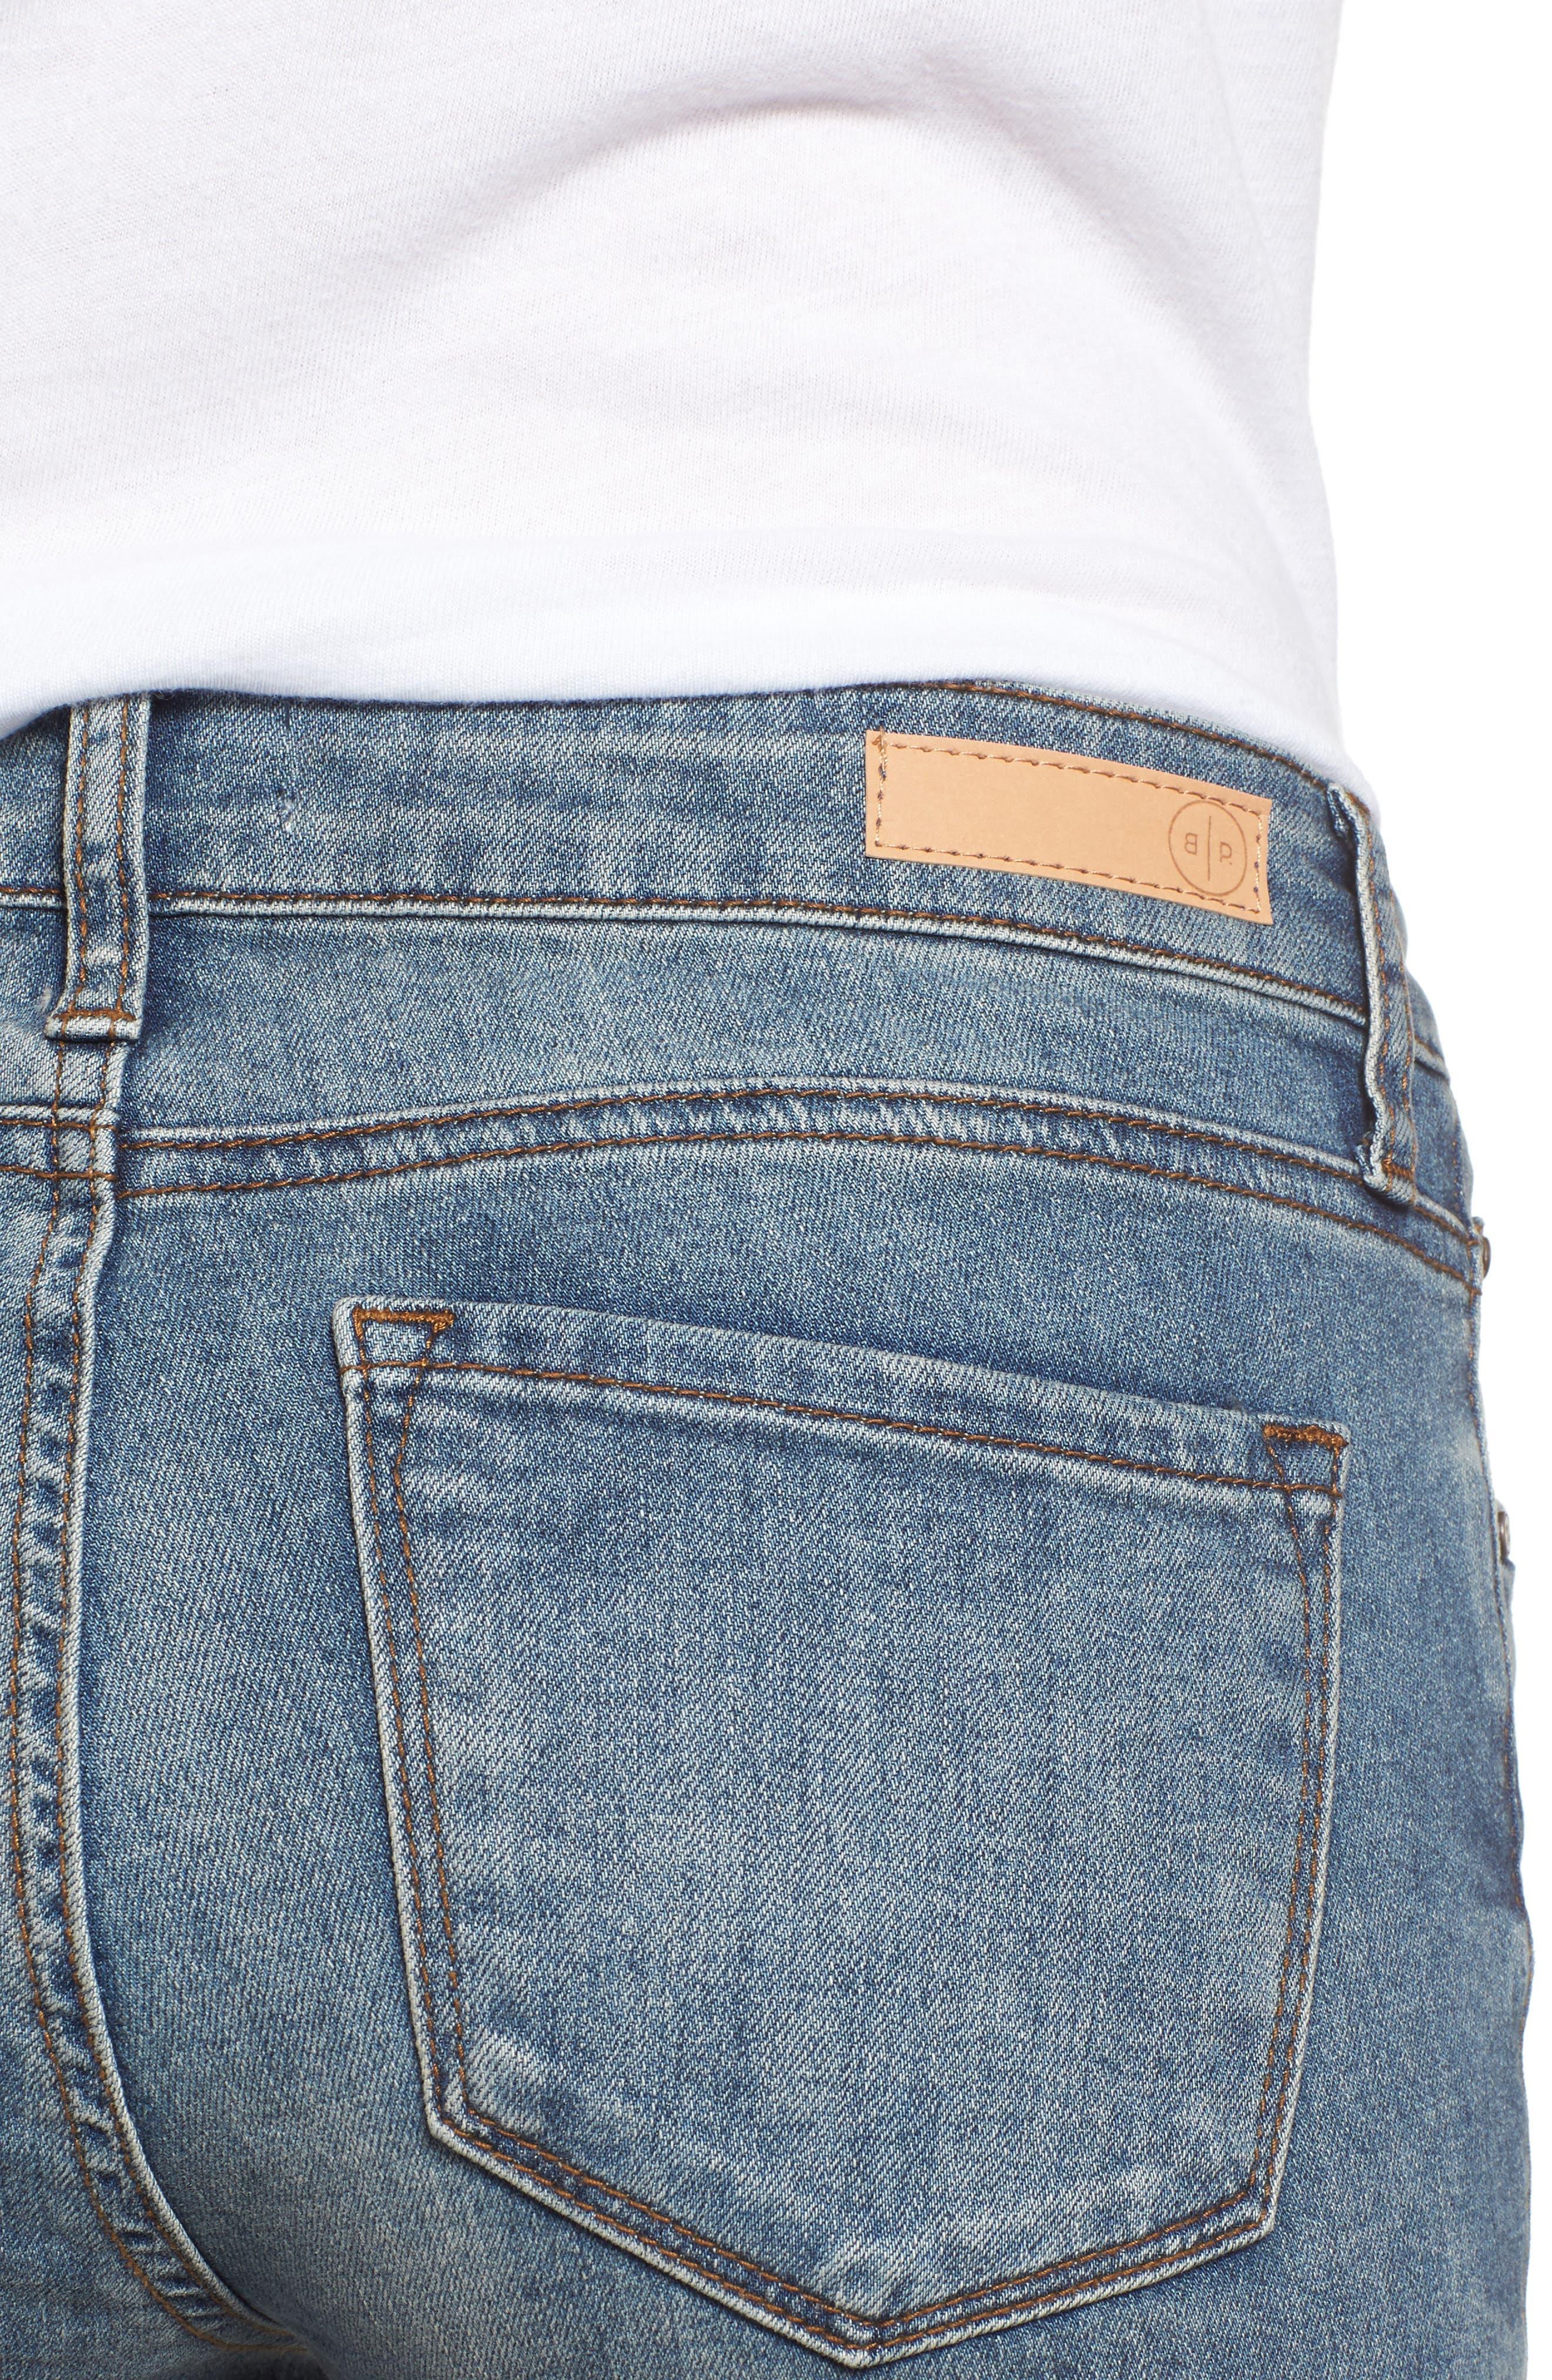 Distressed Skinny Jeans,                             Alternate thumbnail 4, color,                             LIGHT WASH